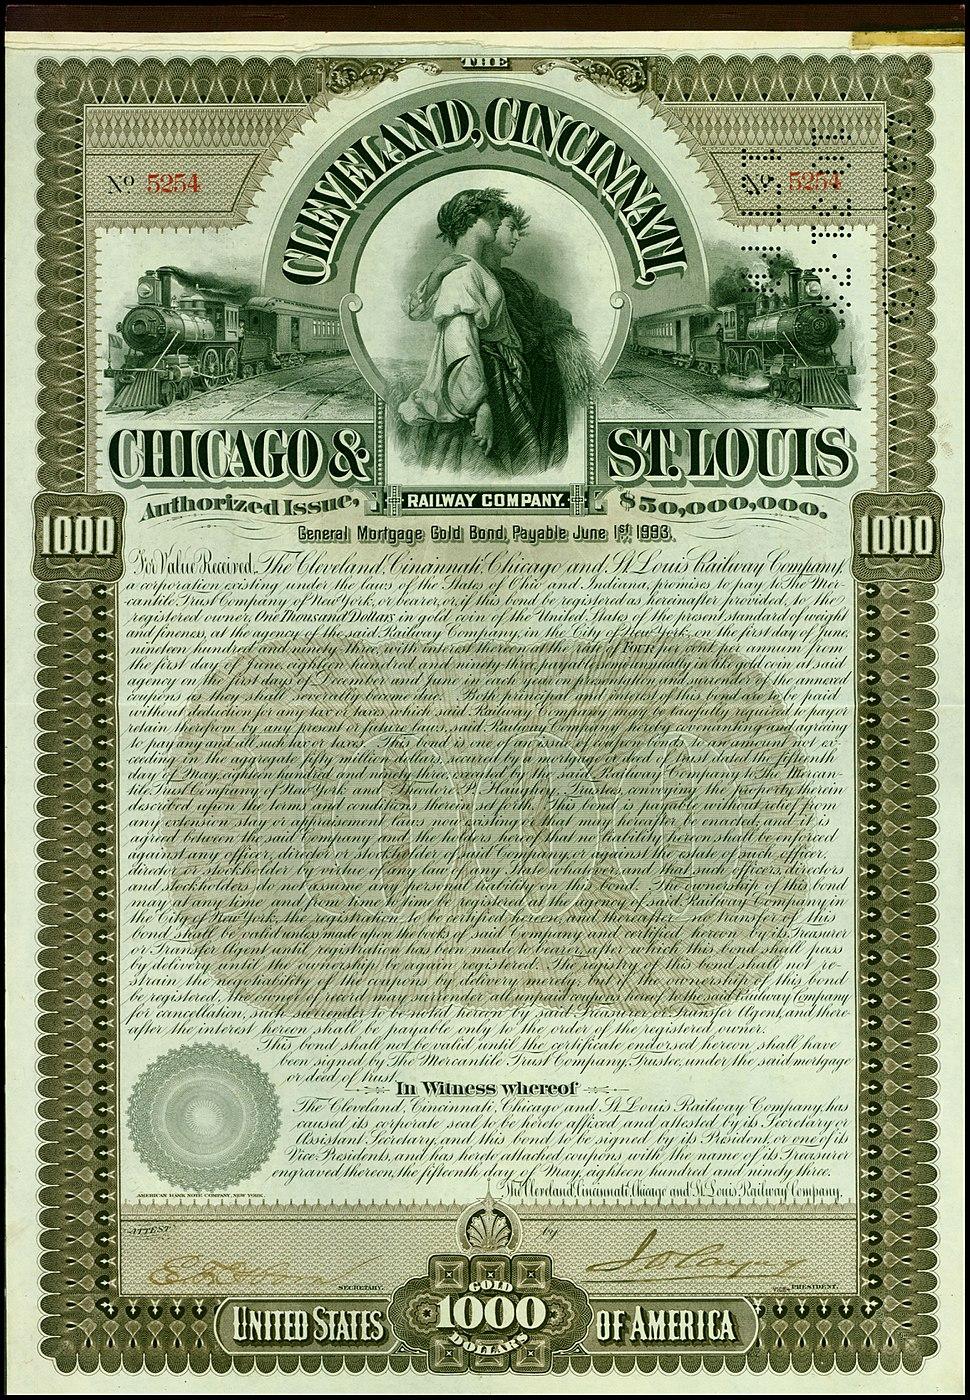 Cleveland, Cincinnati, Chicago & St. Louis RW 1893